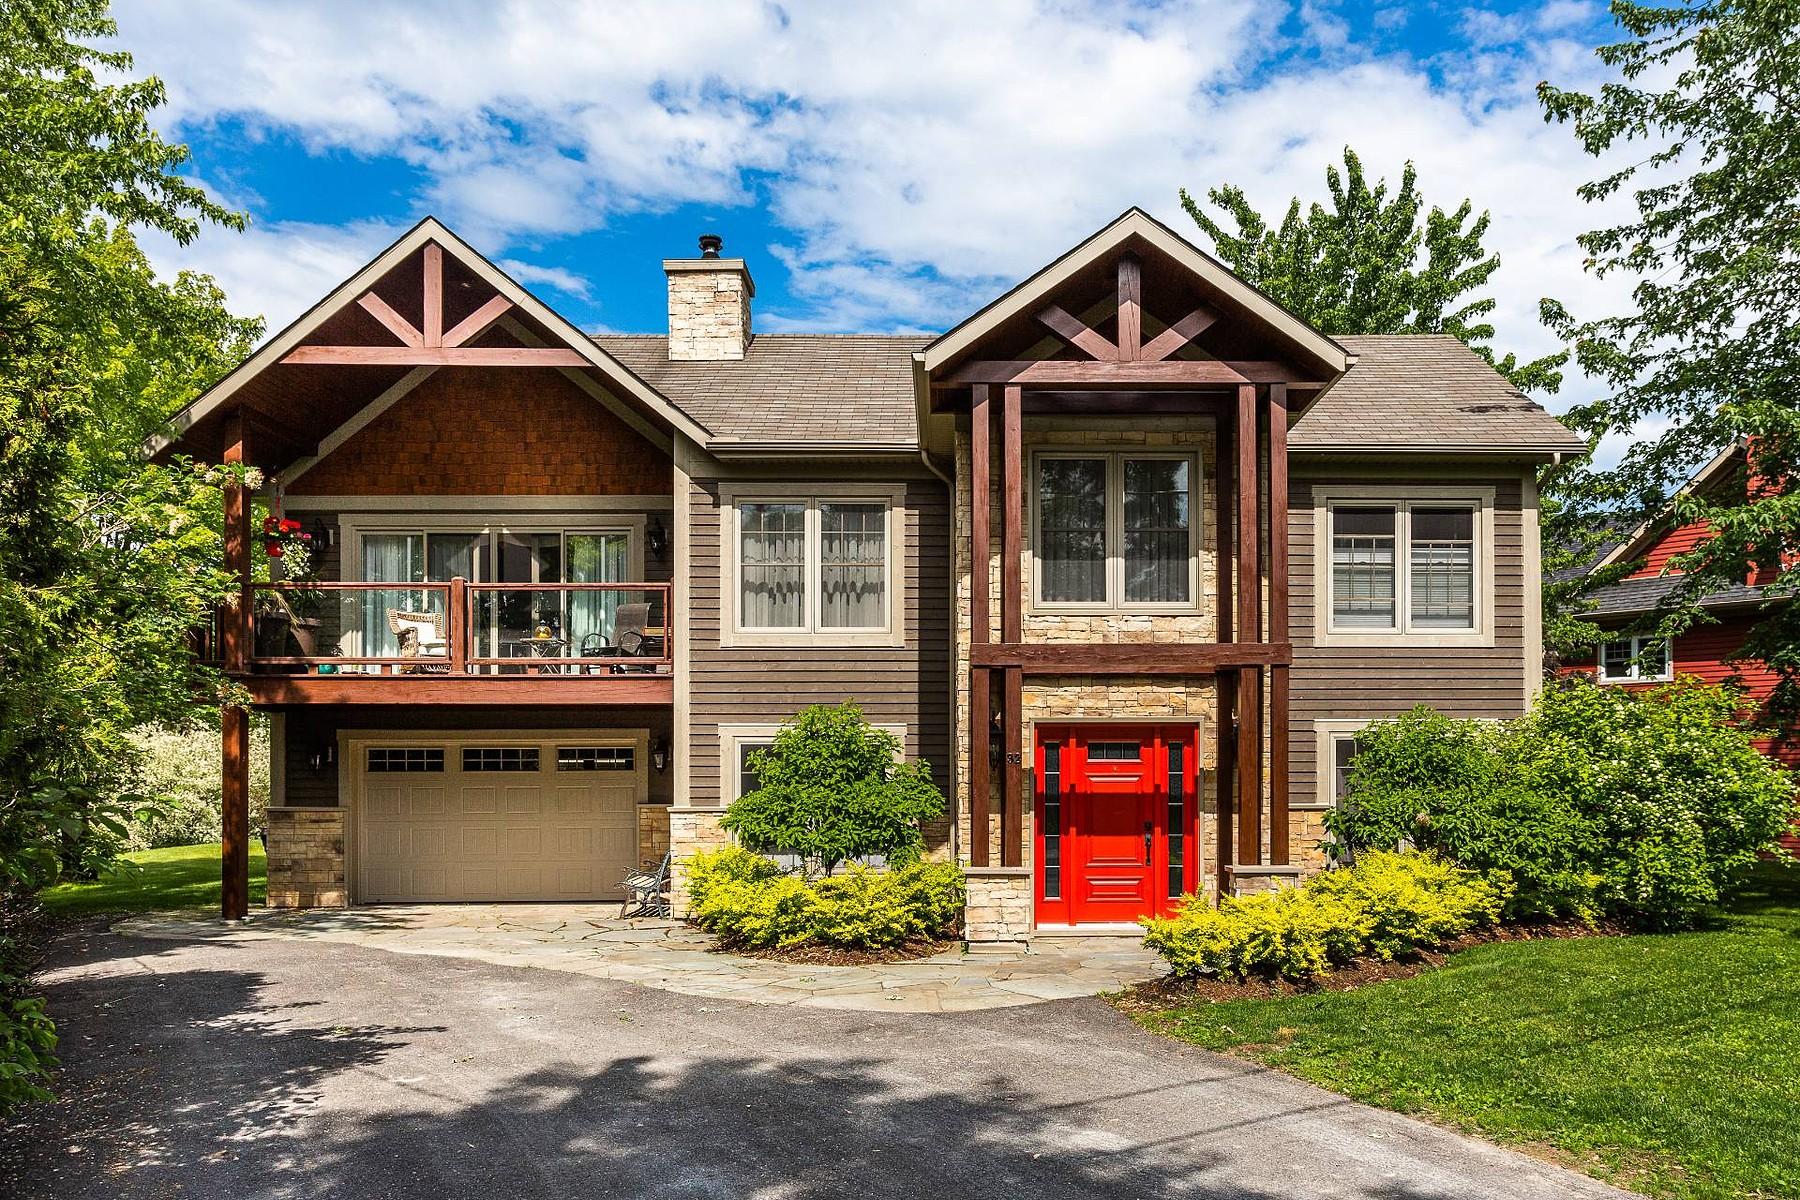 Single Family Homes for Sale at Lac-Brome, Montérégie 32 Rue Robert Lac-Brome, Quebec J0E1R0 Canada